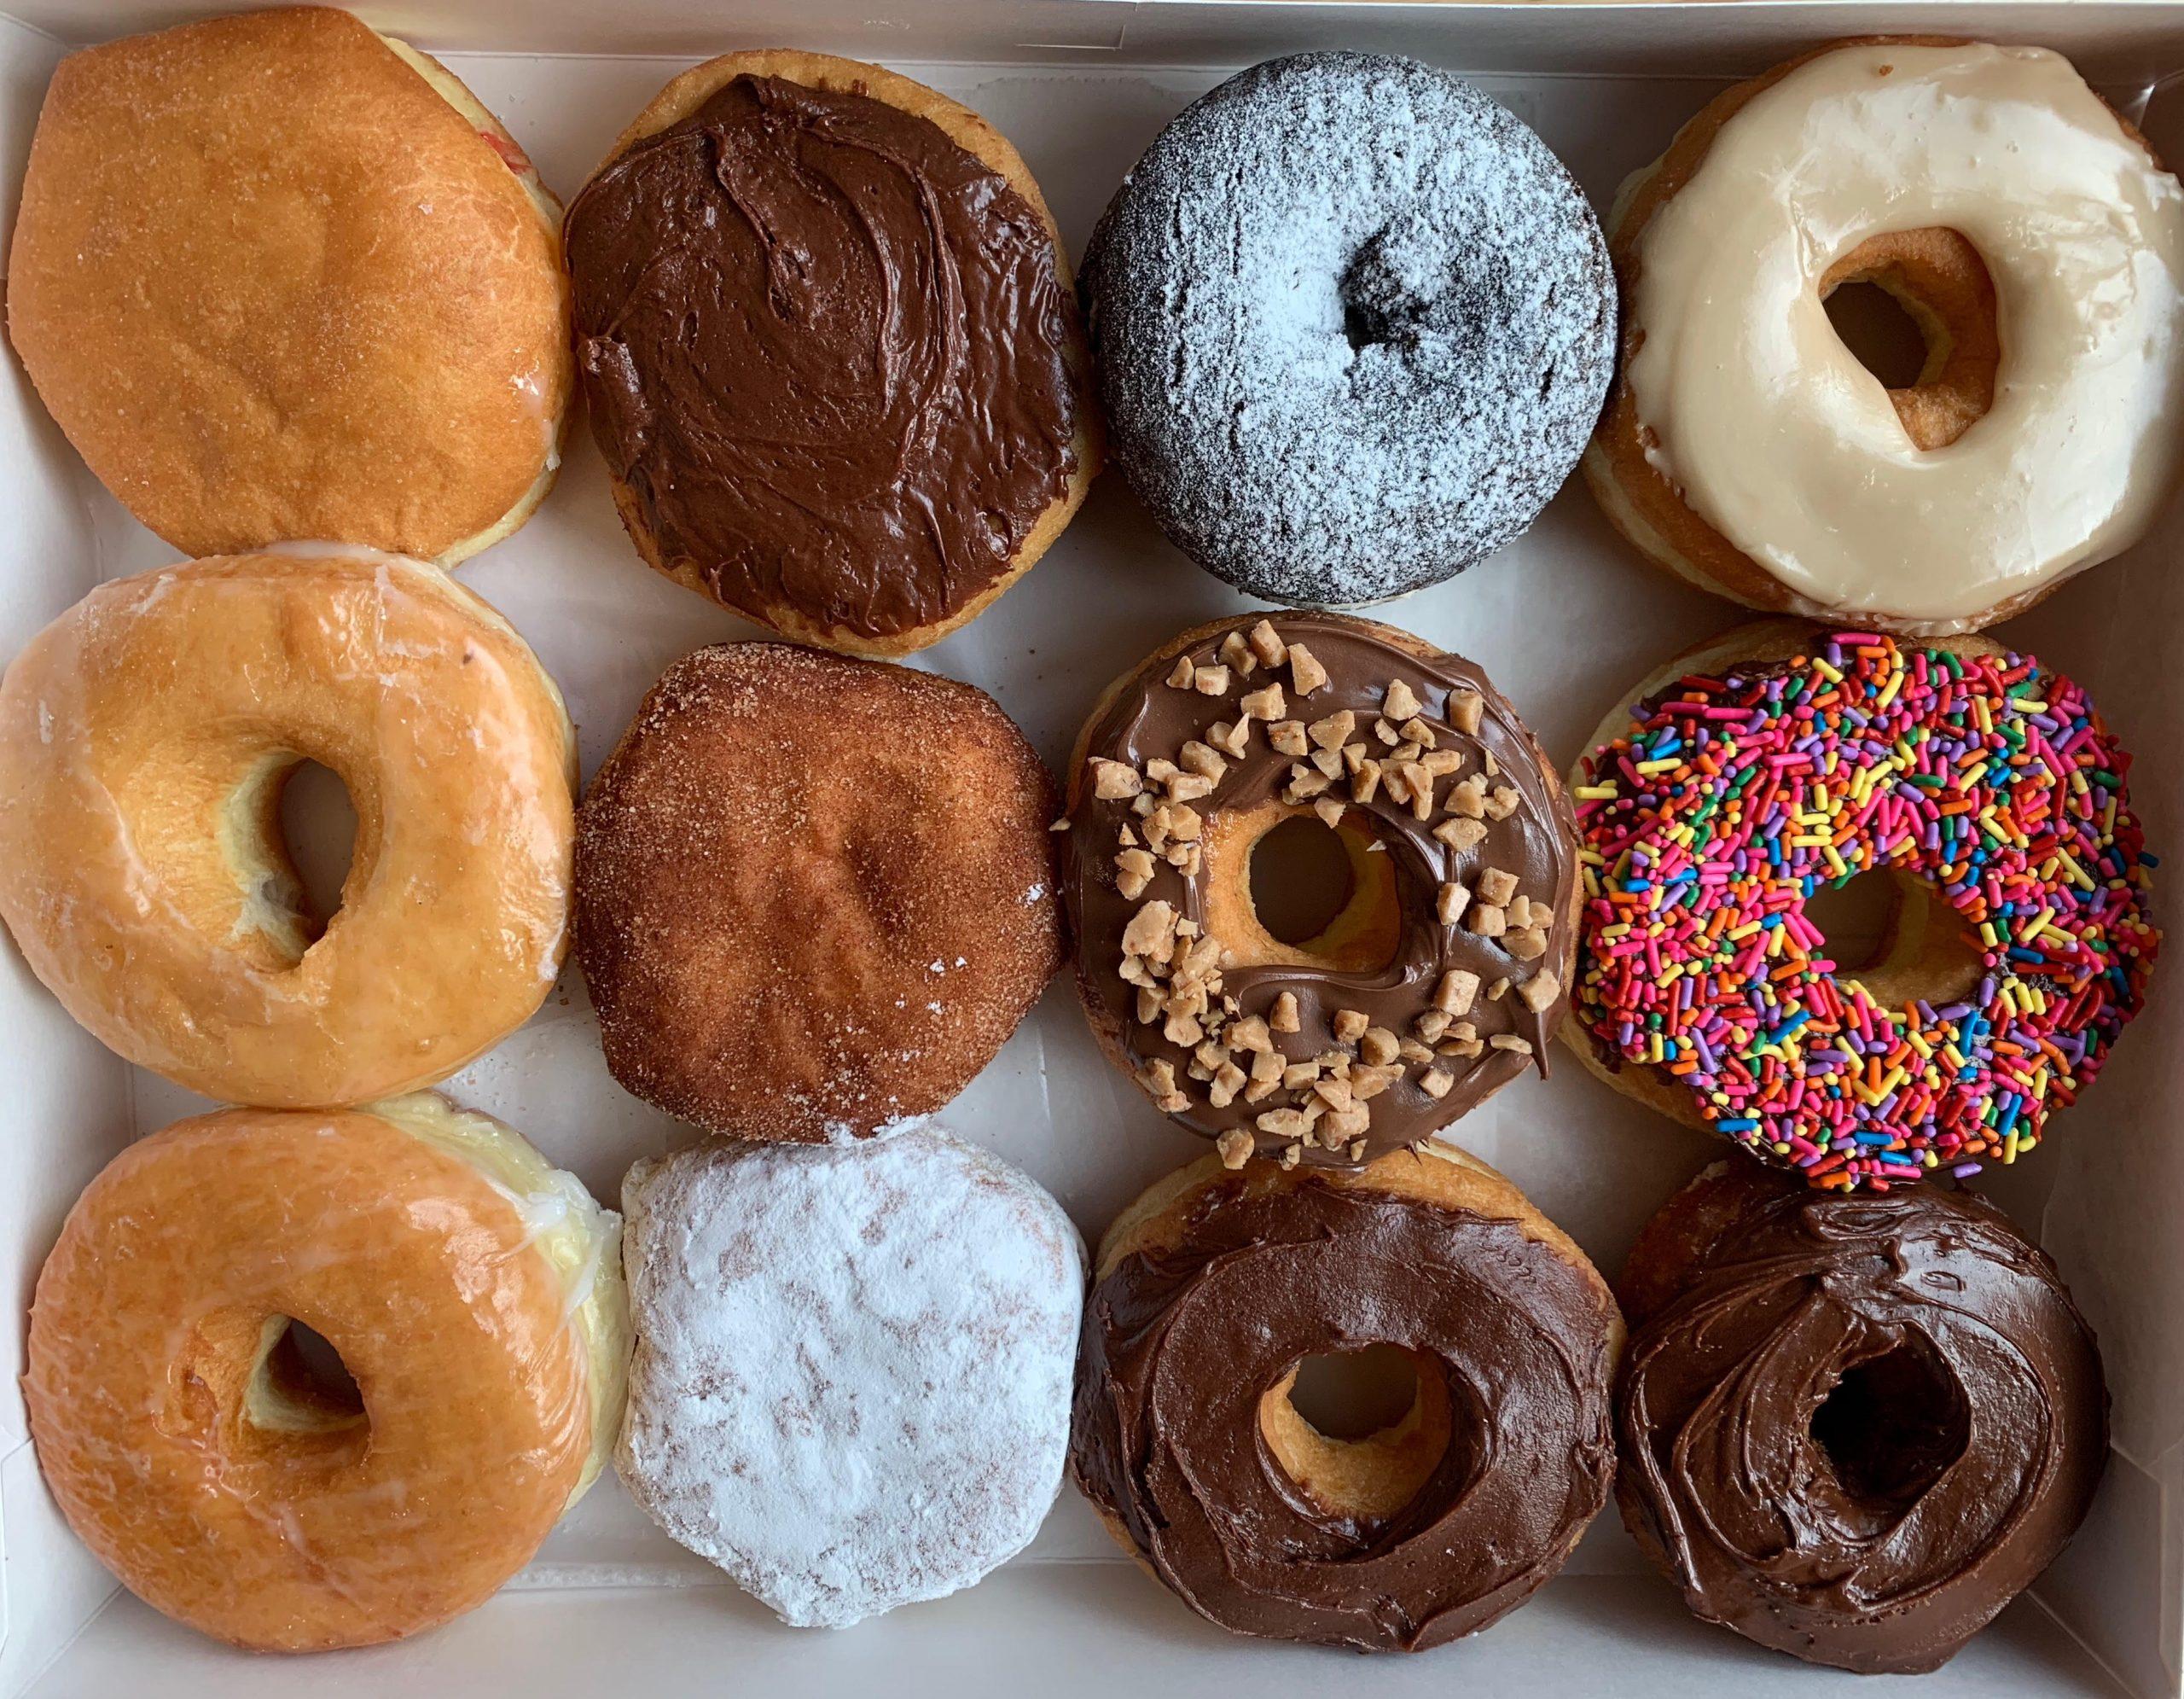 Making the doughnuts in Arlington!